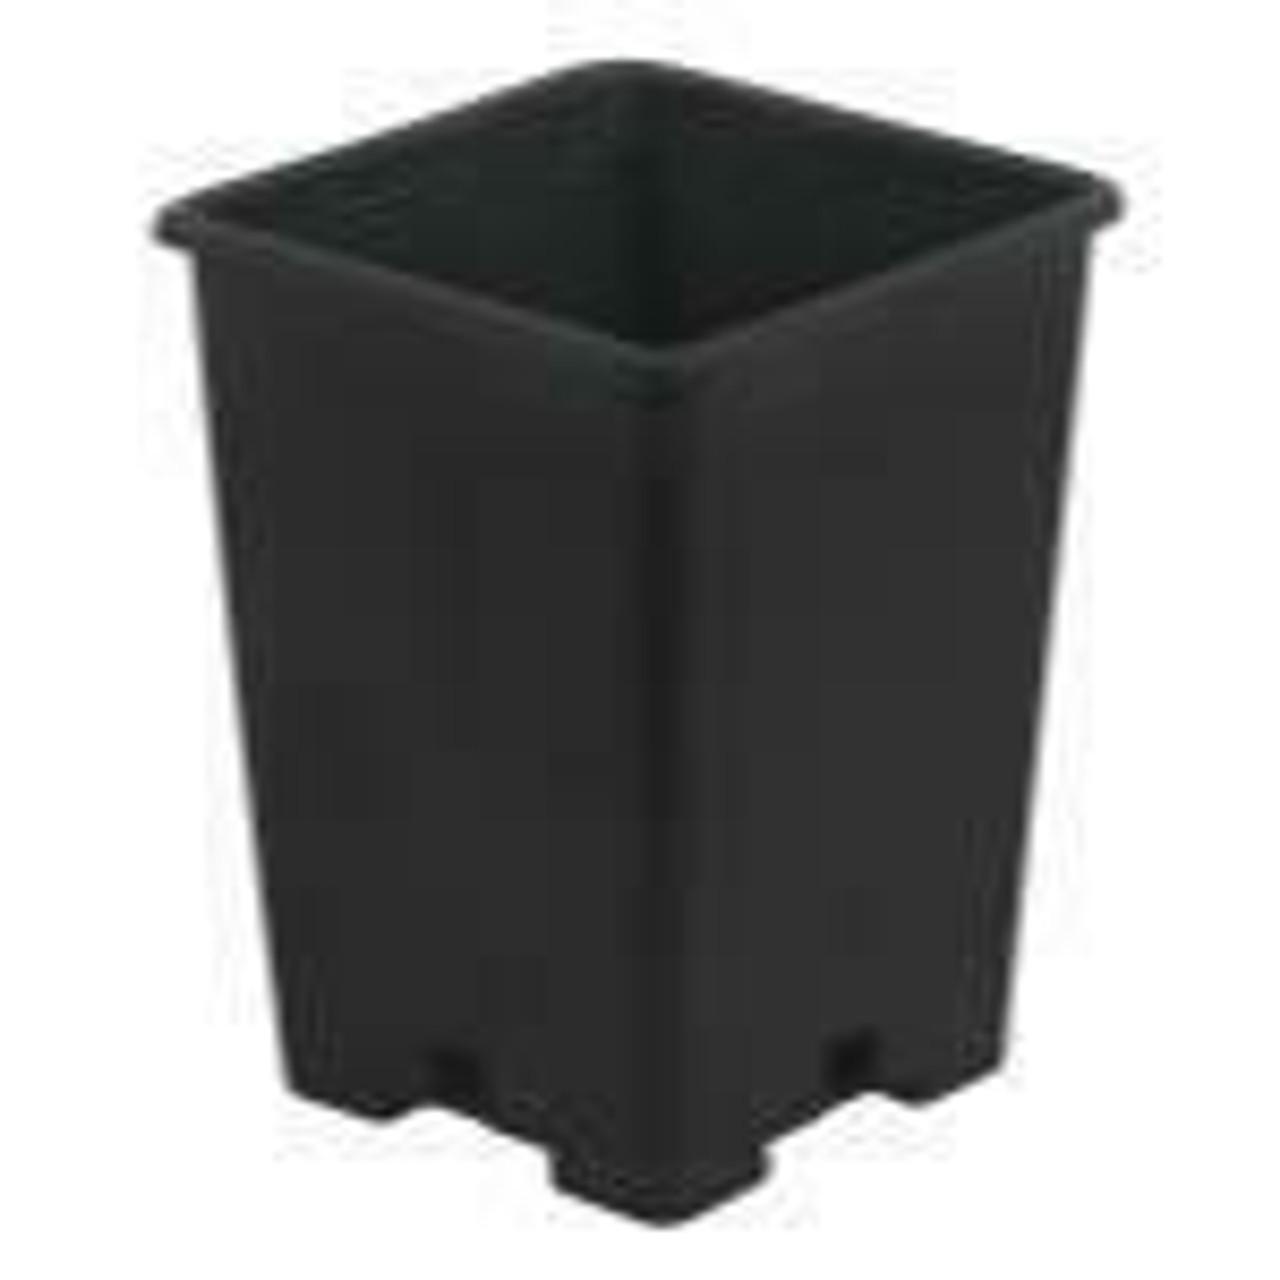 Gro Pro Black Plastic Square Pot 5 x 5 x 7 in - 1